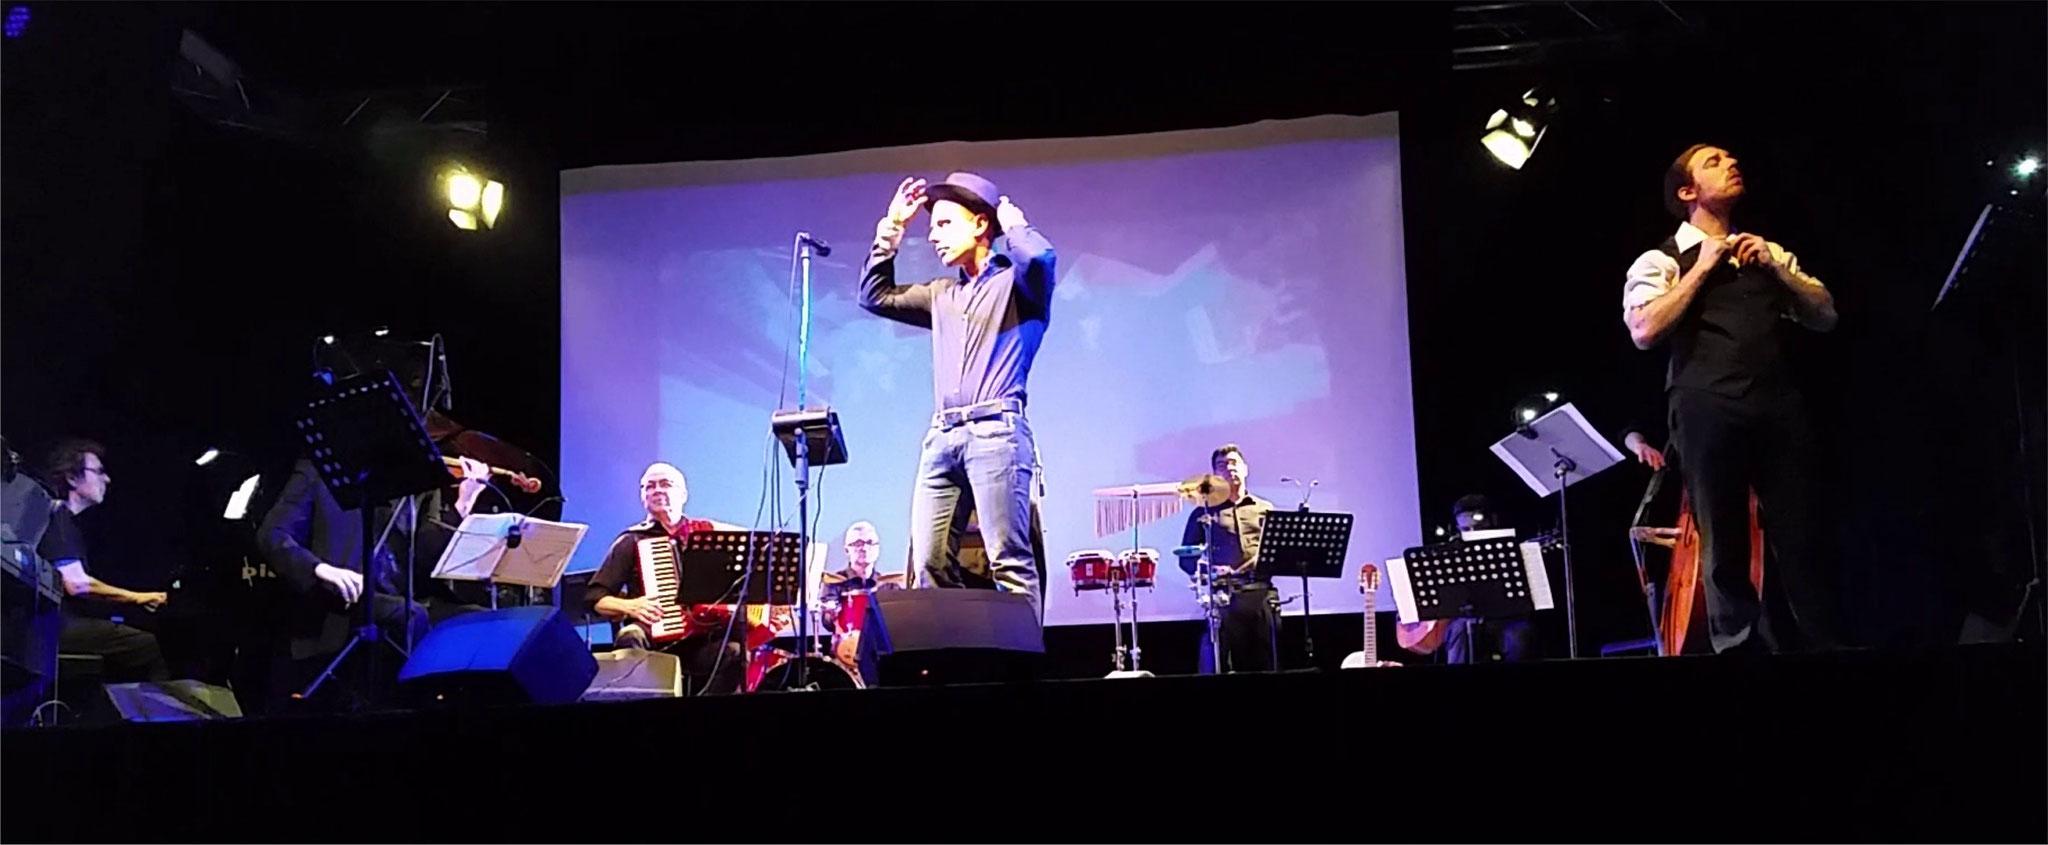 Dario Salomone, voce solista